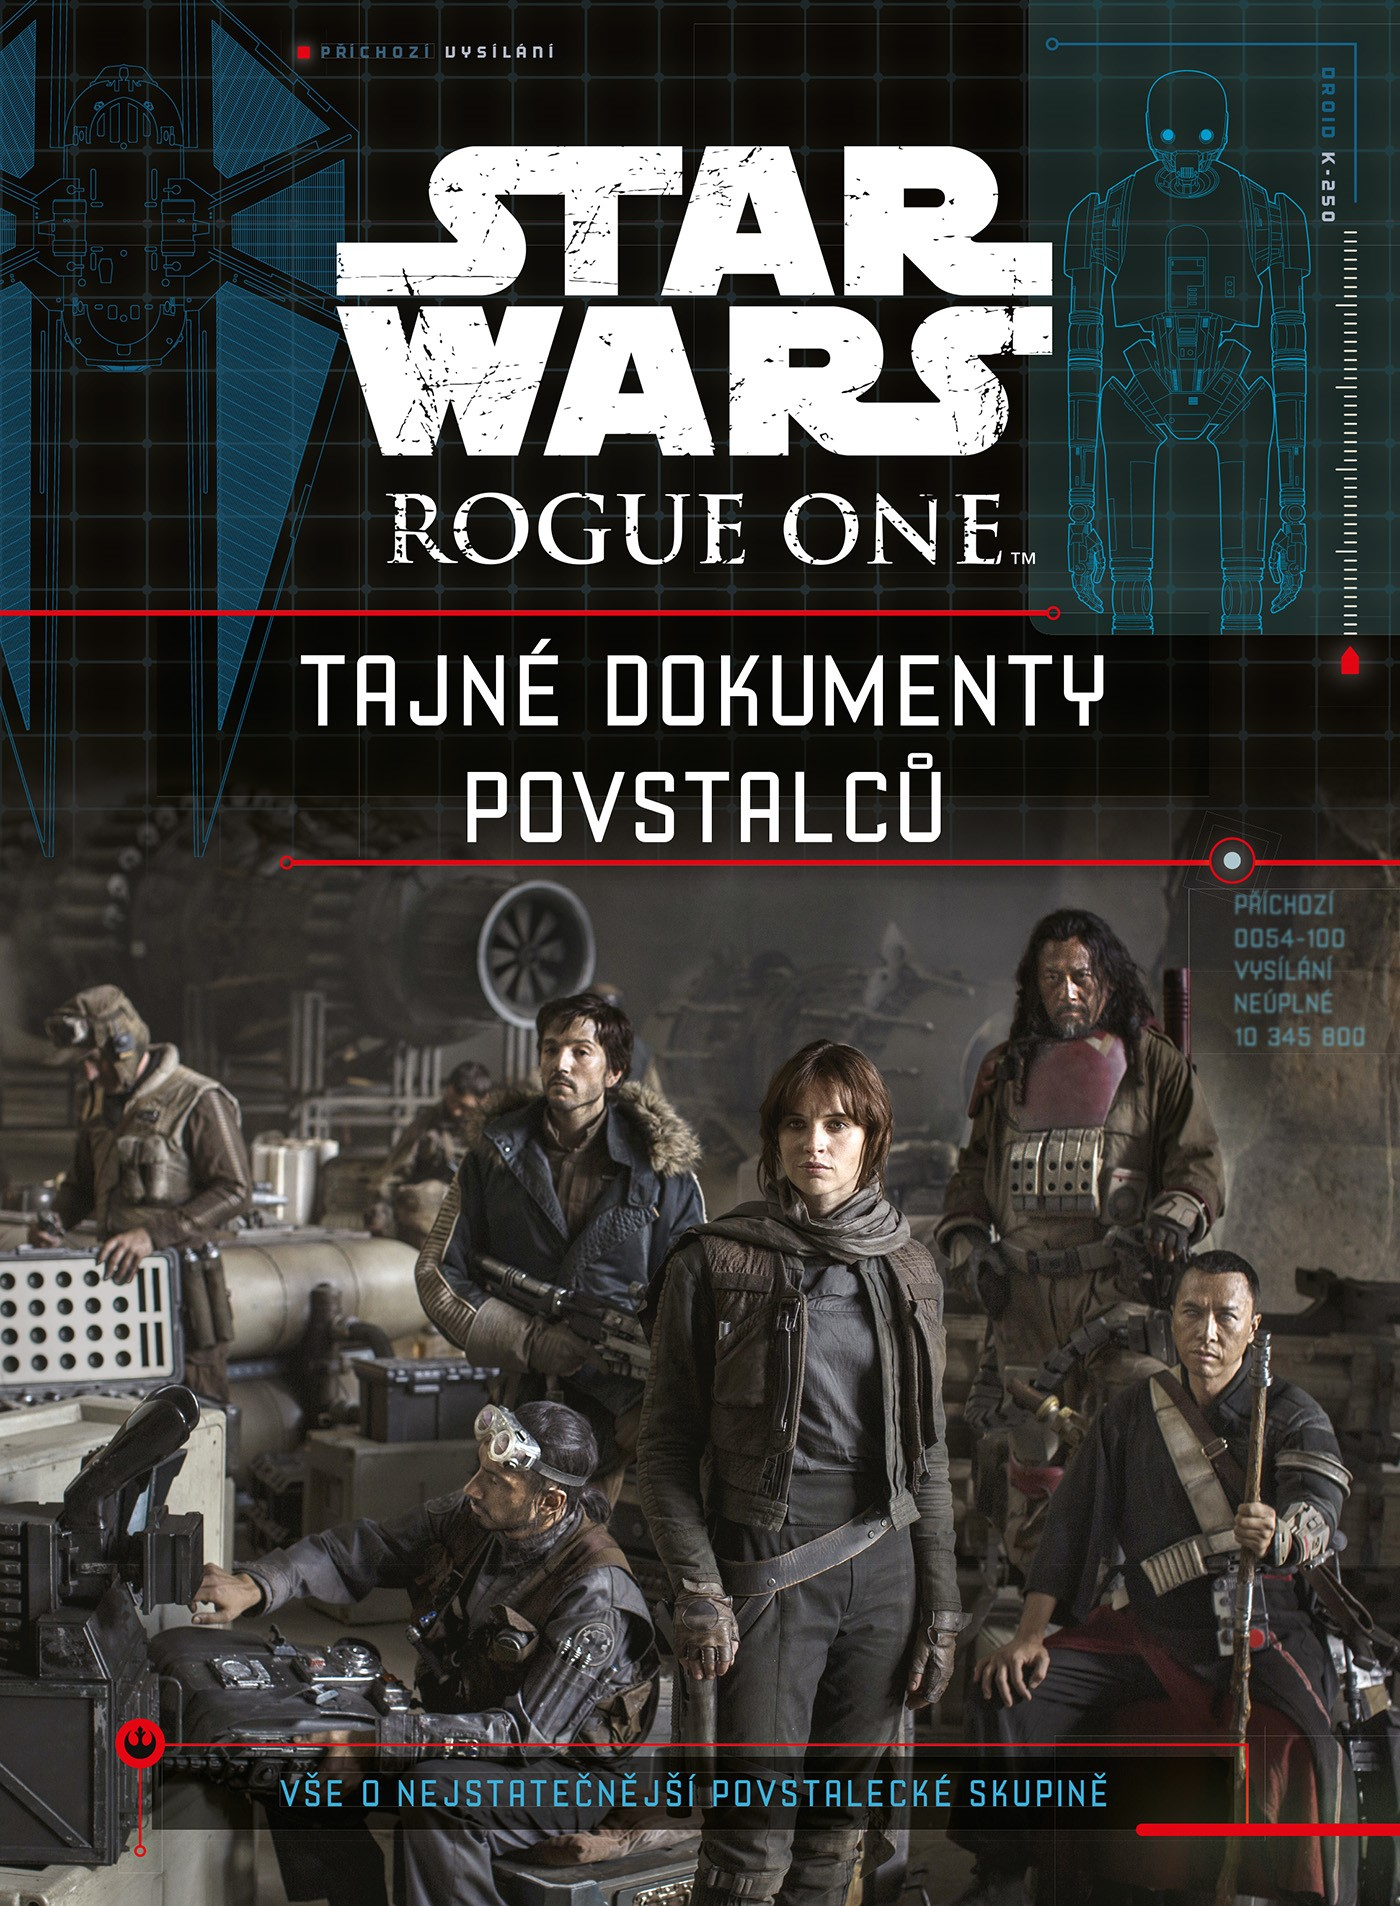 "Star Wars <span class=""highlight"">Rogue One</span> Tajné dokumenty povstalců"